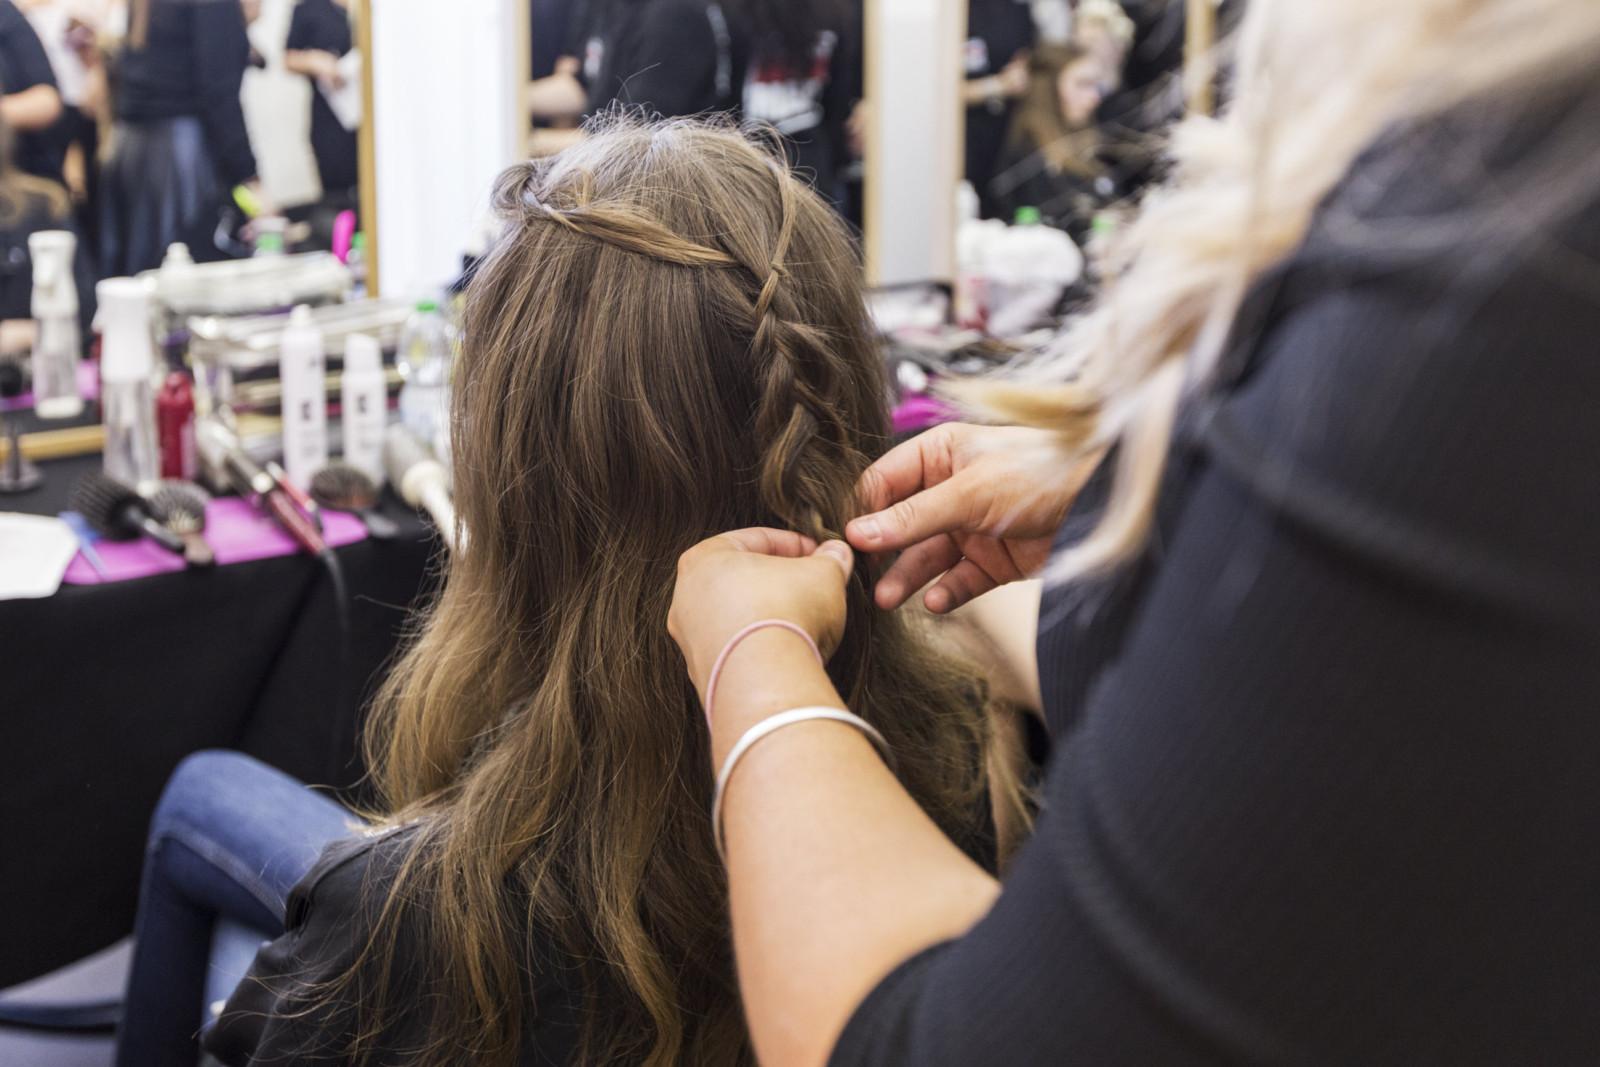 Fashion Week Alberta Ferretti hairstyle Toni and Guy